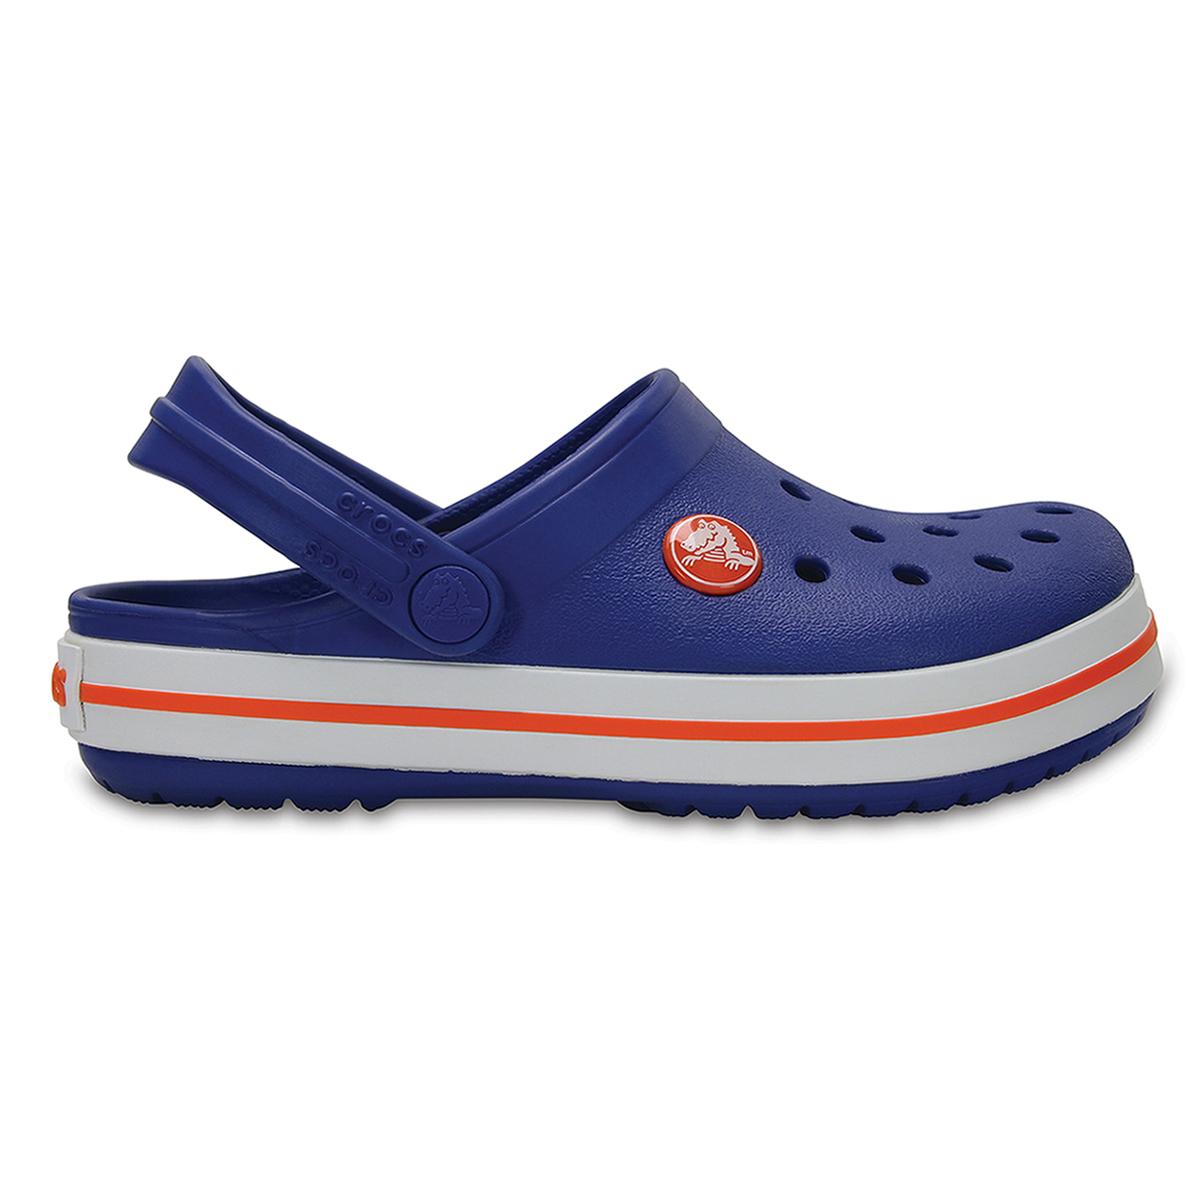 Crocs Crocband Clog K - Gök Mavisi